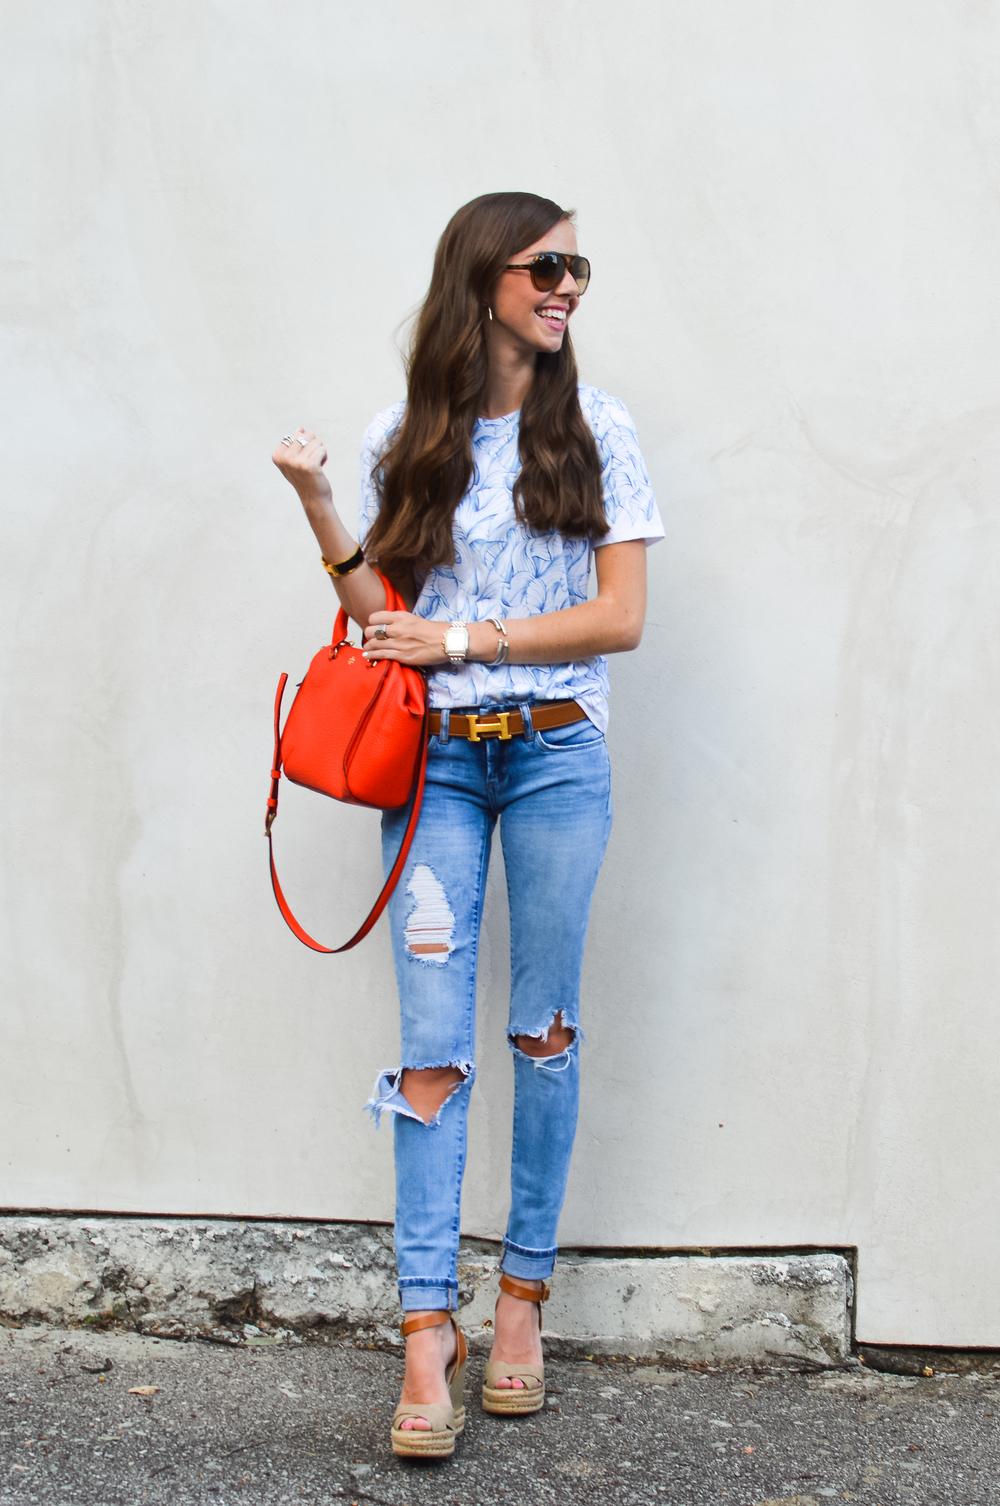 lcb_style_fashion_blogger_tory burch top (19 of 29).jpg